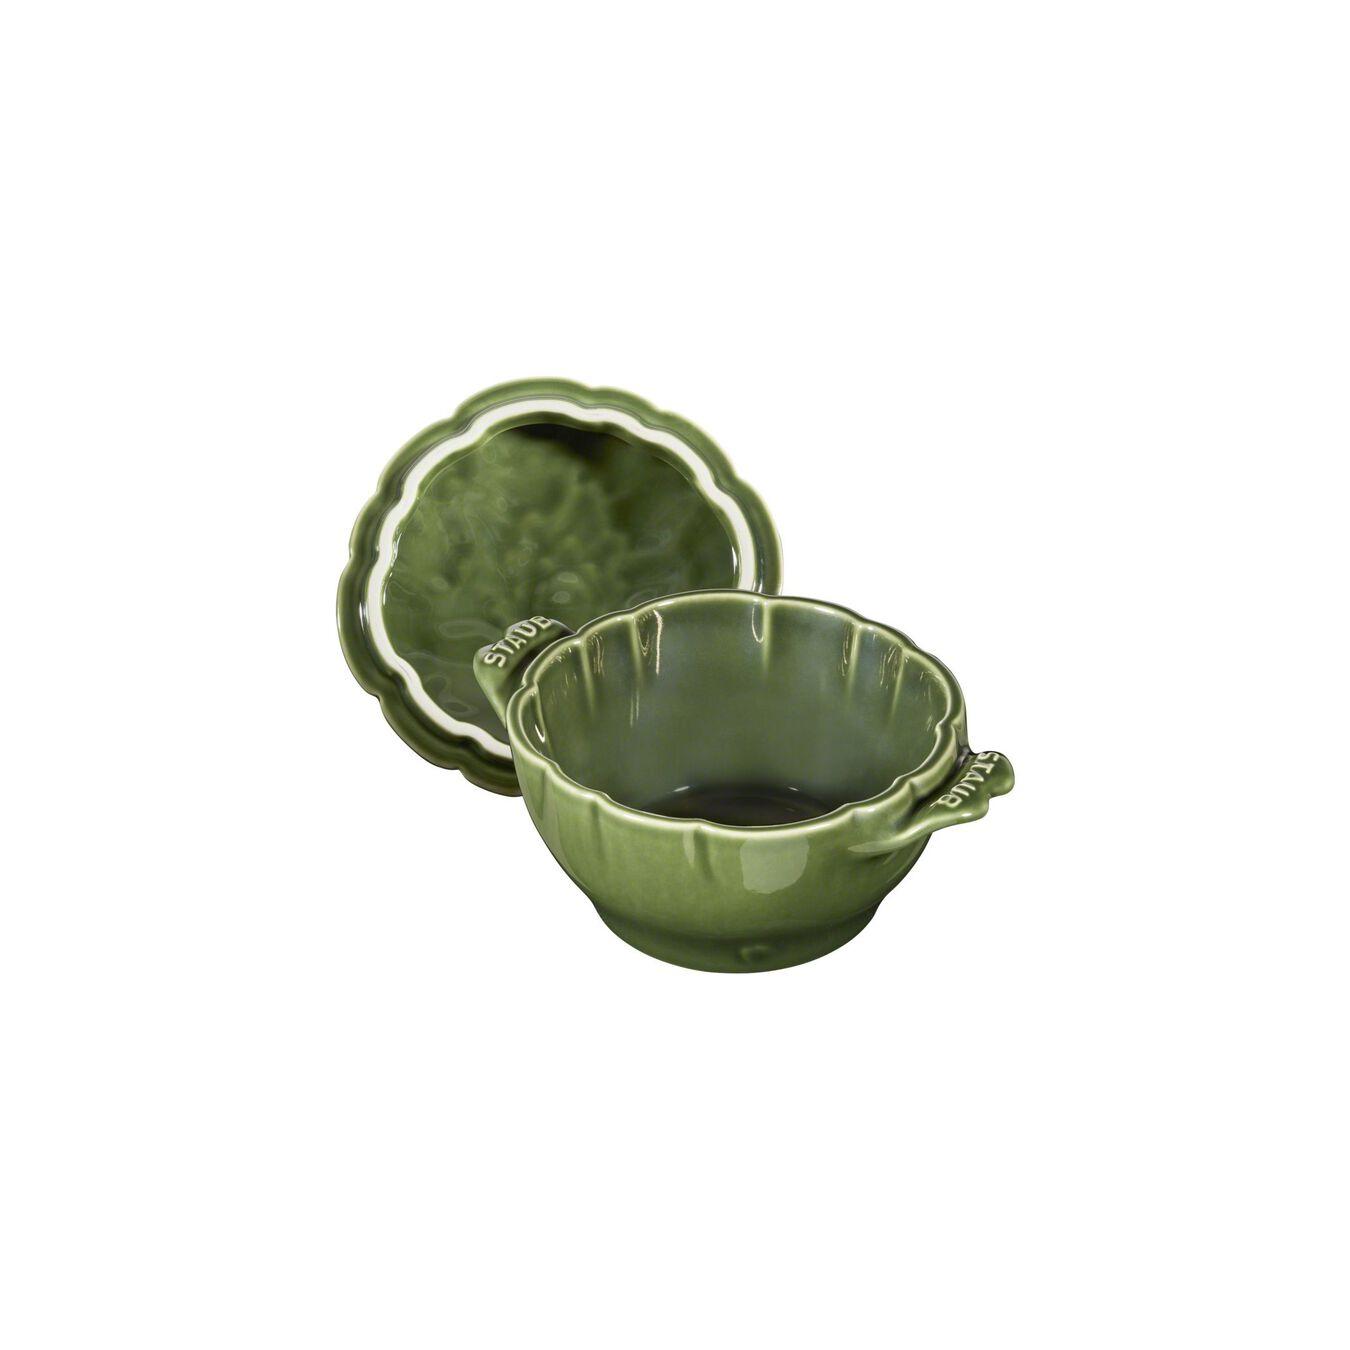 Cocotte 13 cm, Artischocke, Basilikum-Grün, Keramik,,large 13